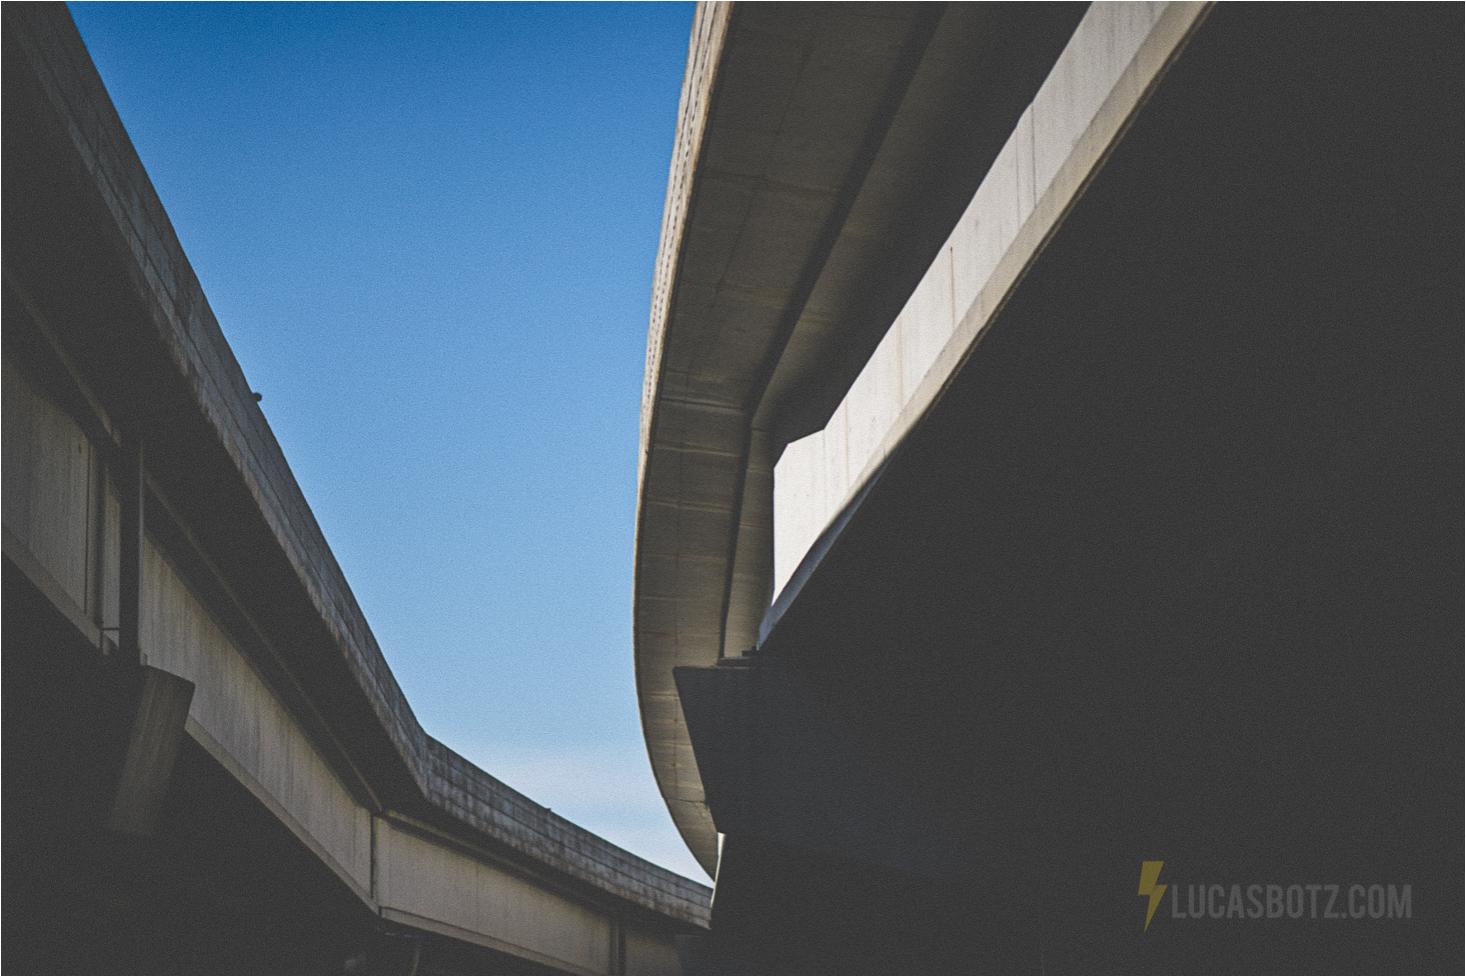 Minneapolis_Minnesota_Lucas_Botz_Photography_7.jpg